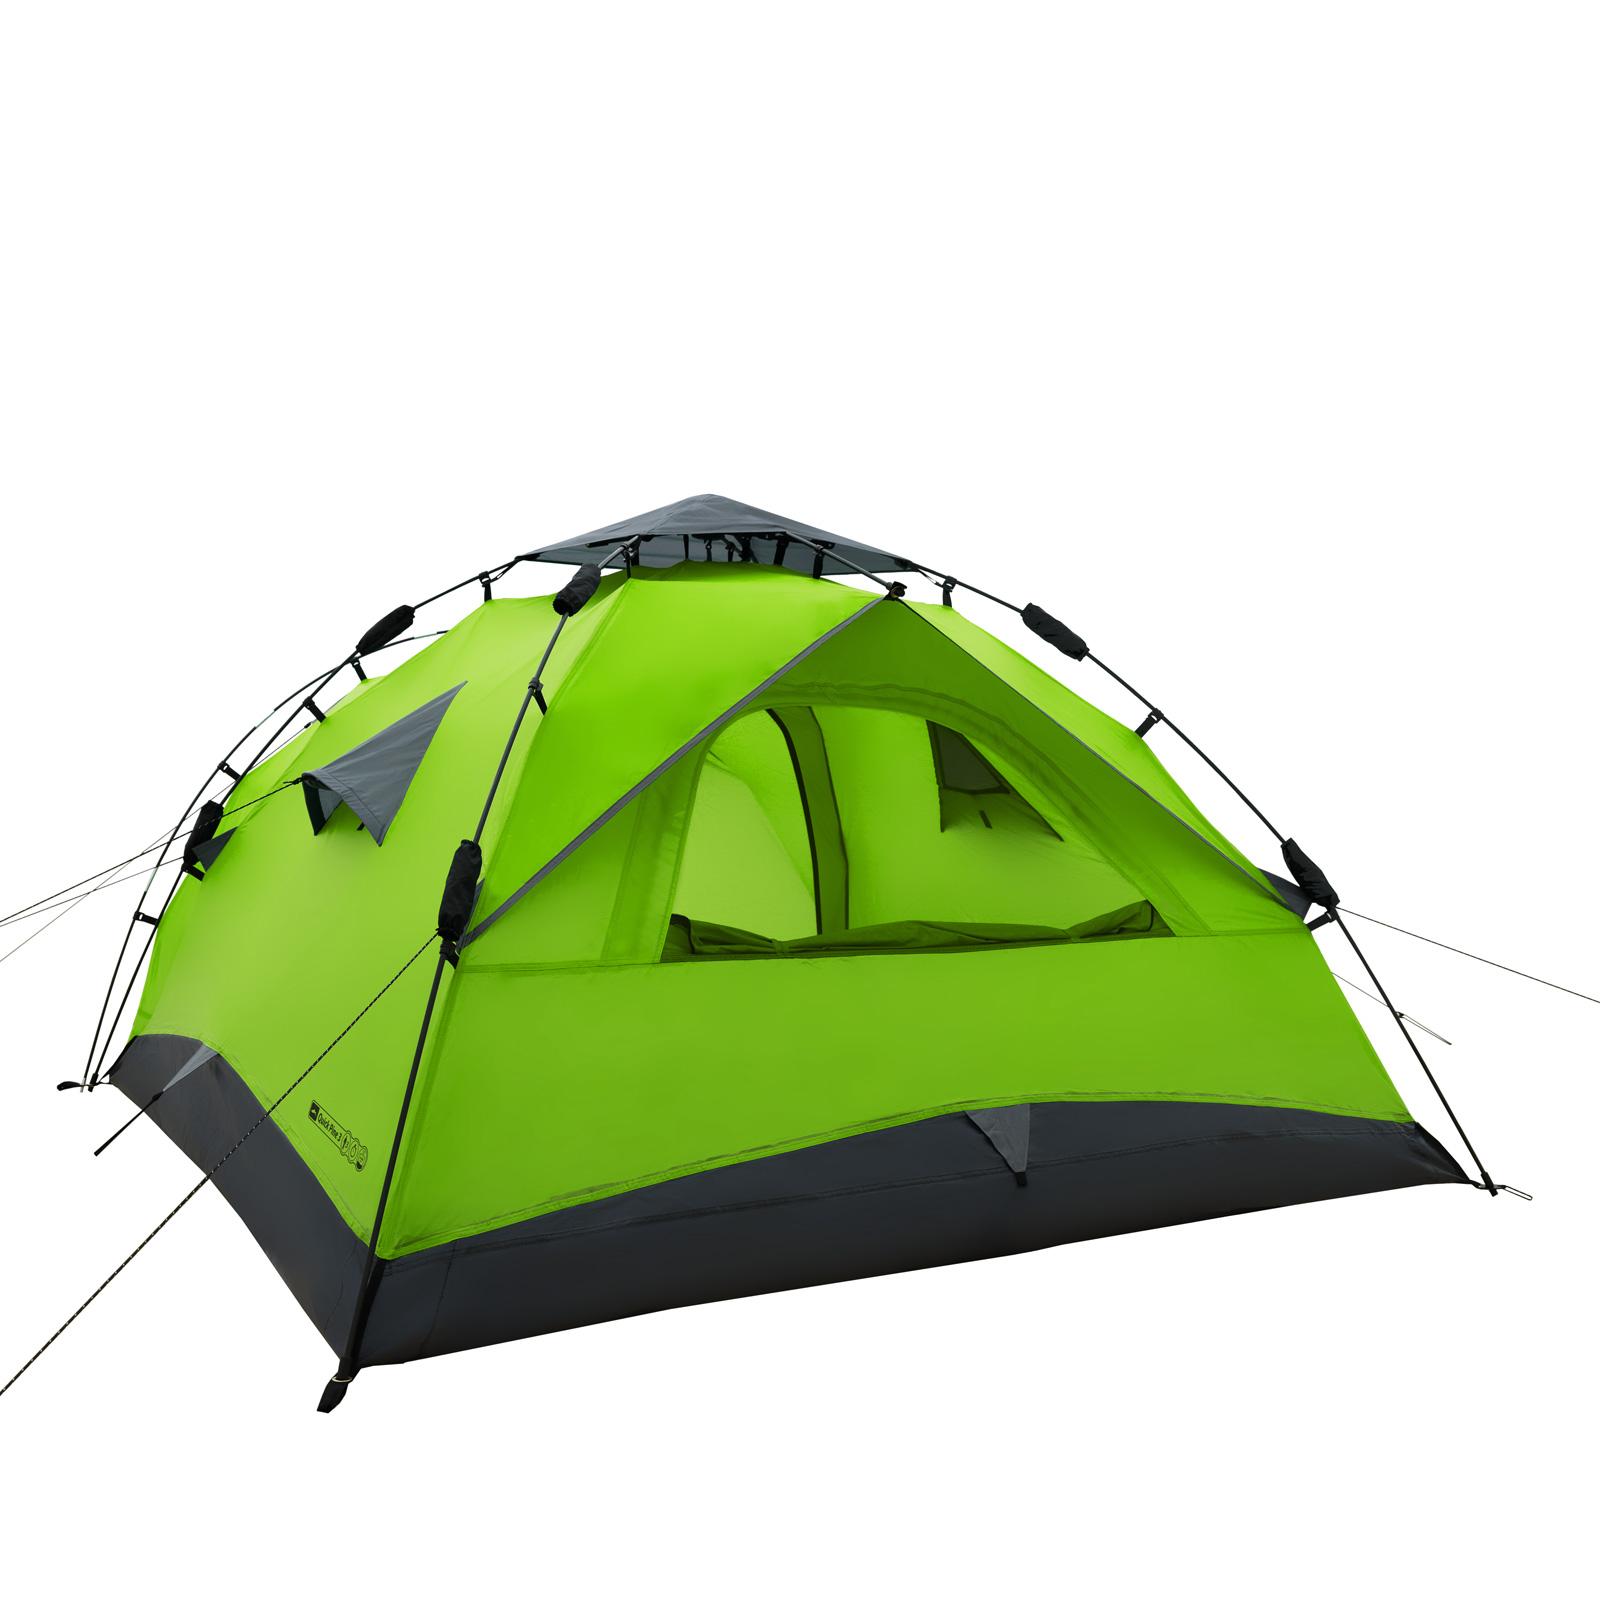 Zelt Kaufen In Holland : Sekundenzelt qeedo quick pine personen zelt campingzelt